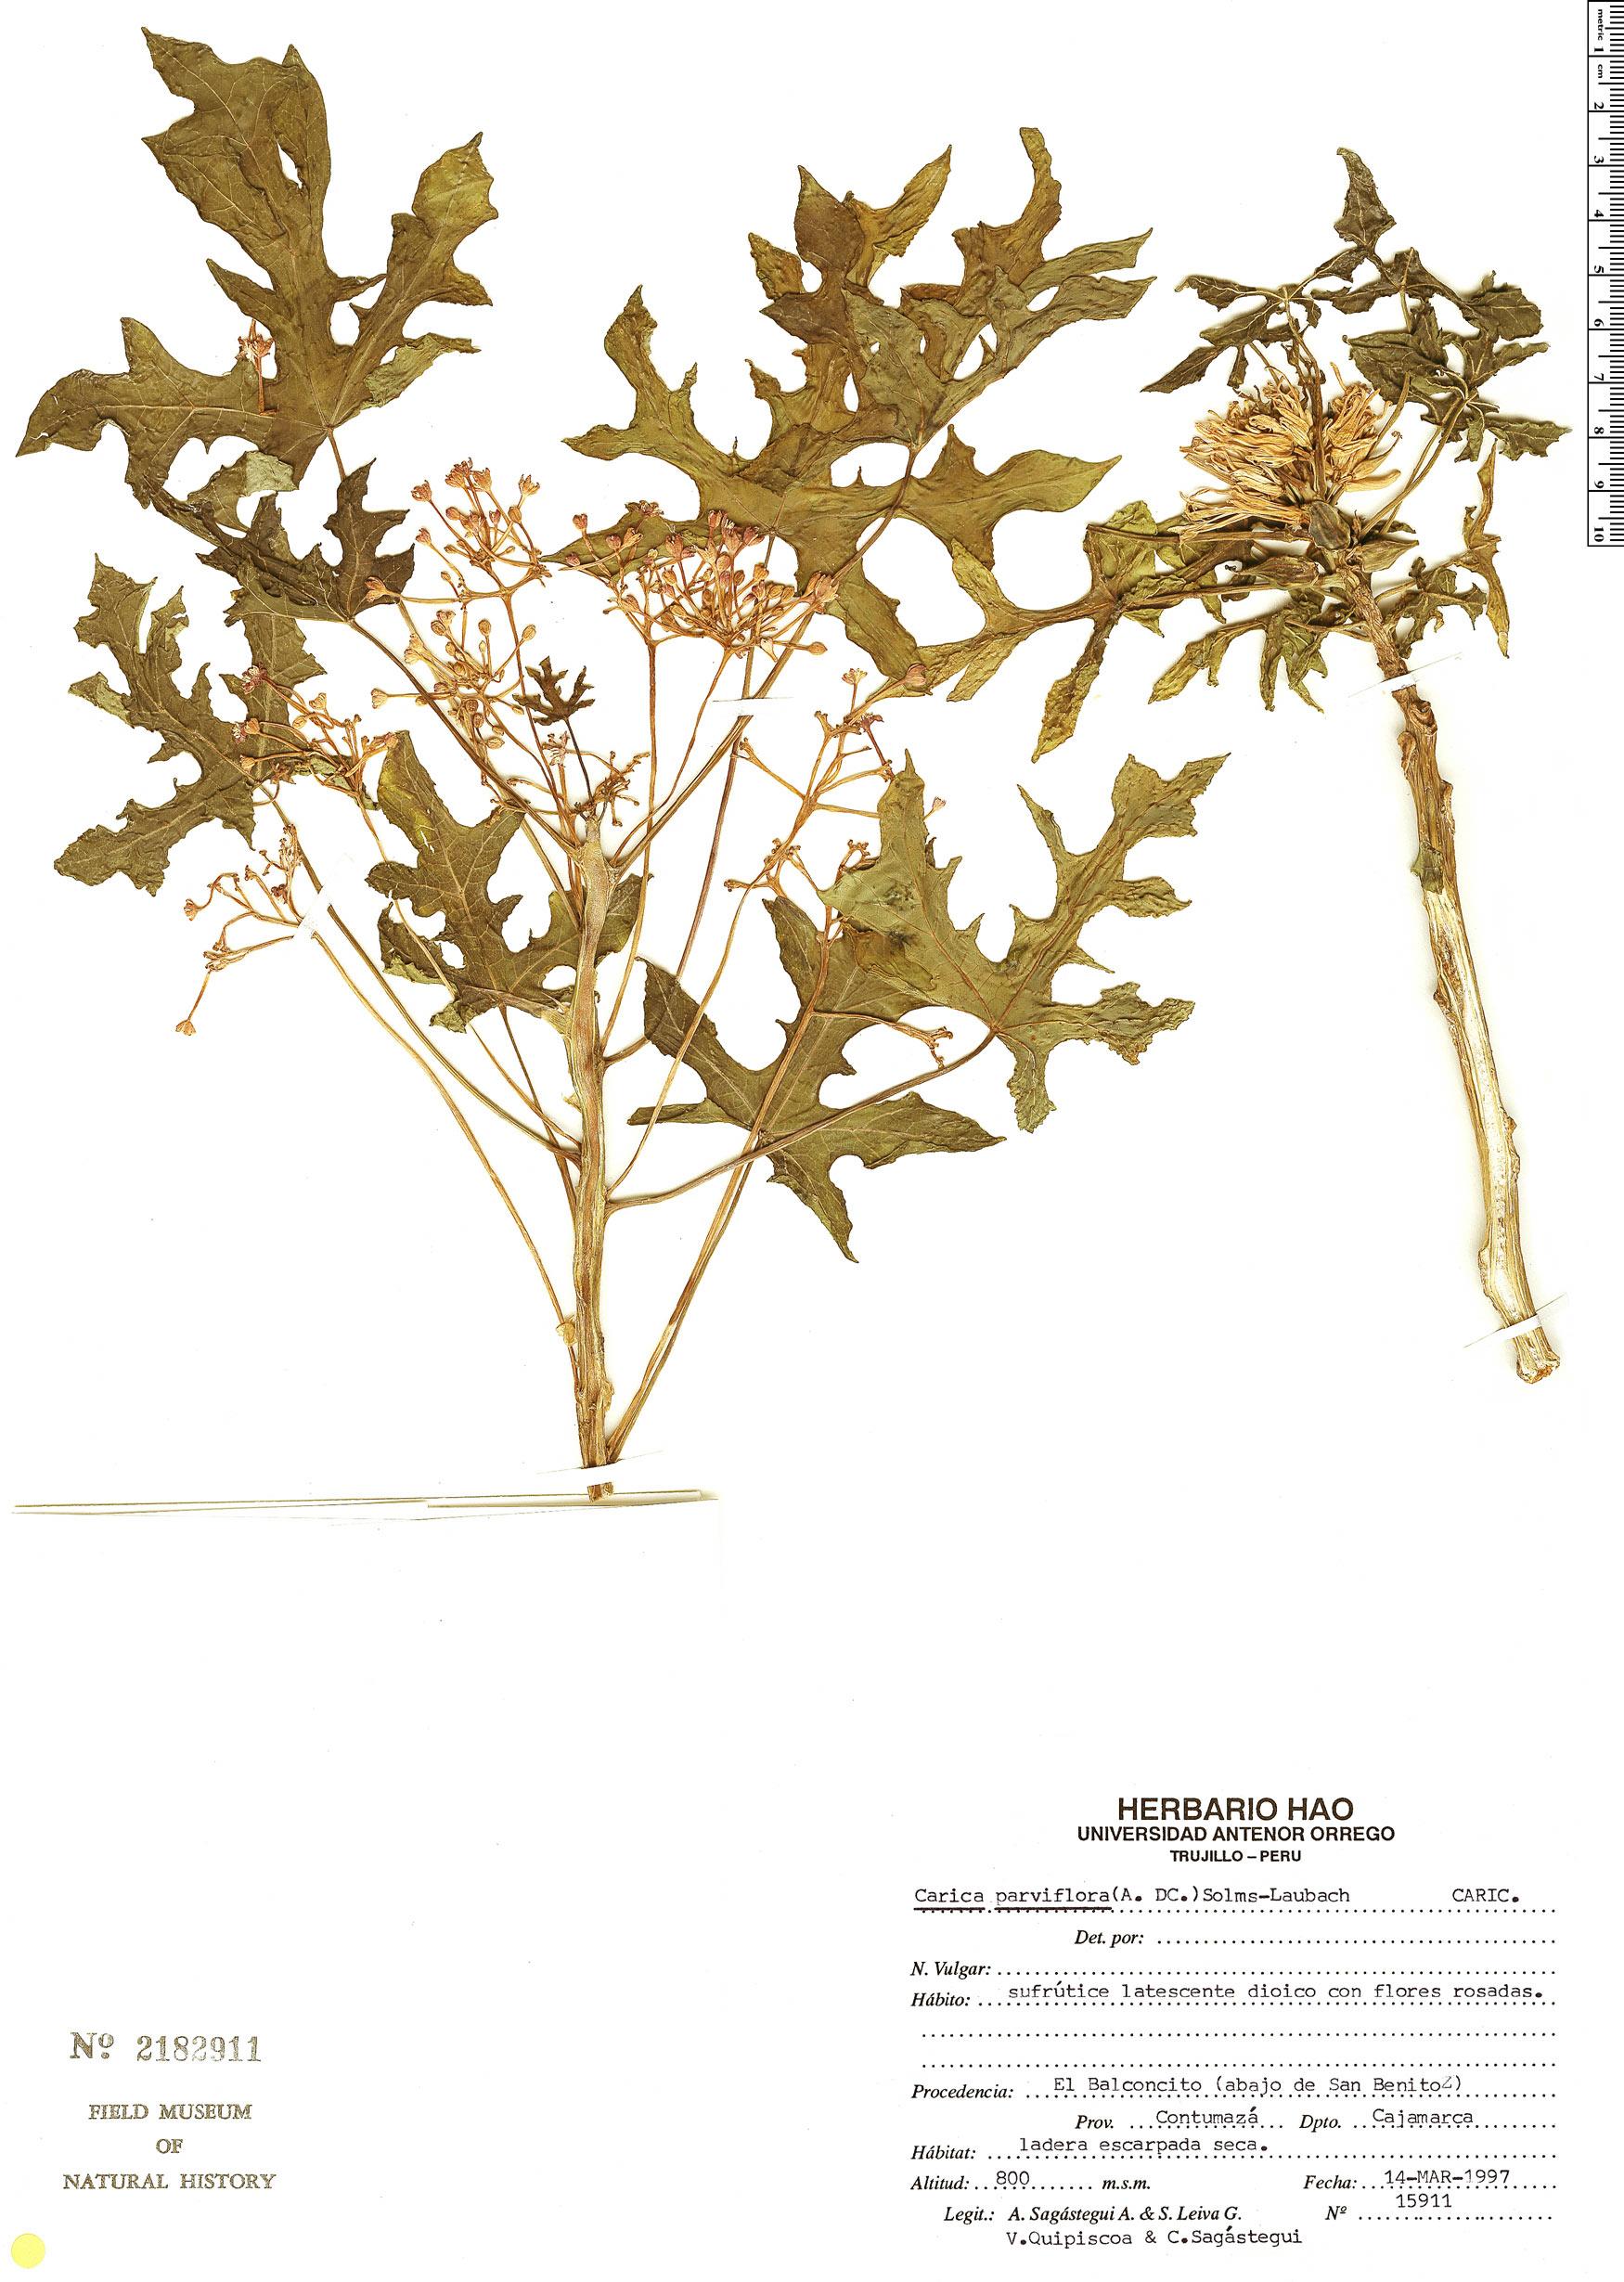 Specimen: Vasconcellea parviflora